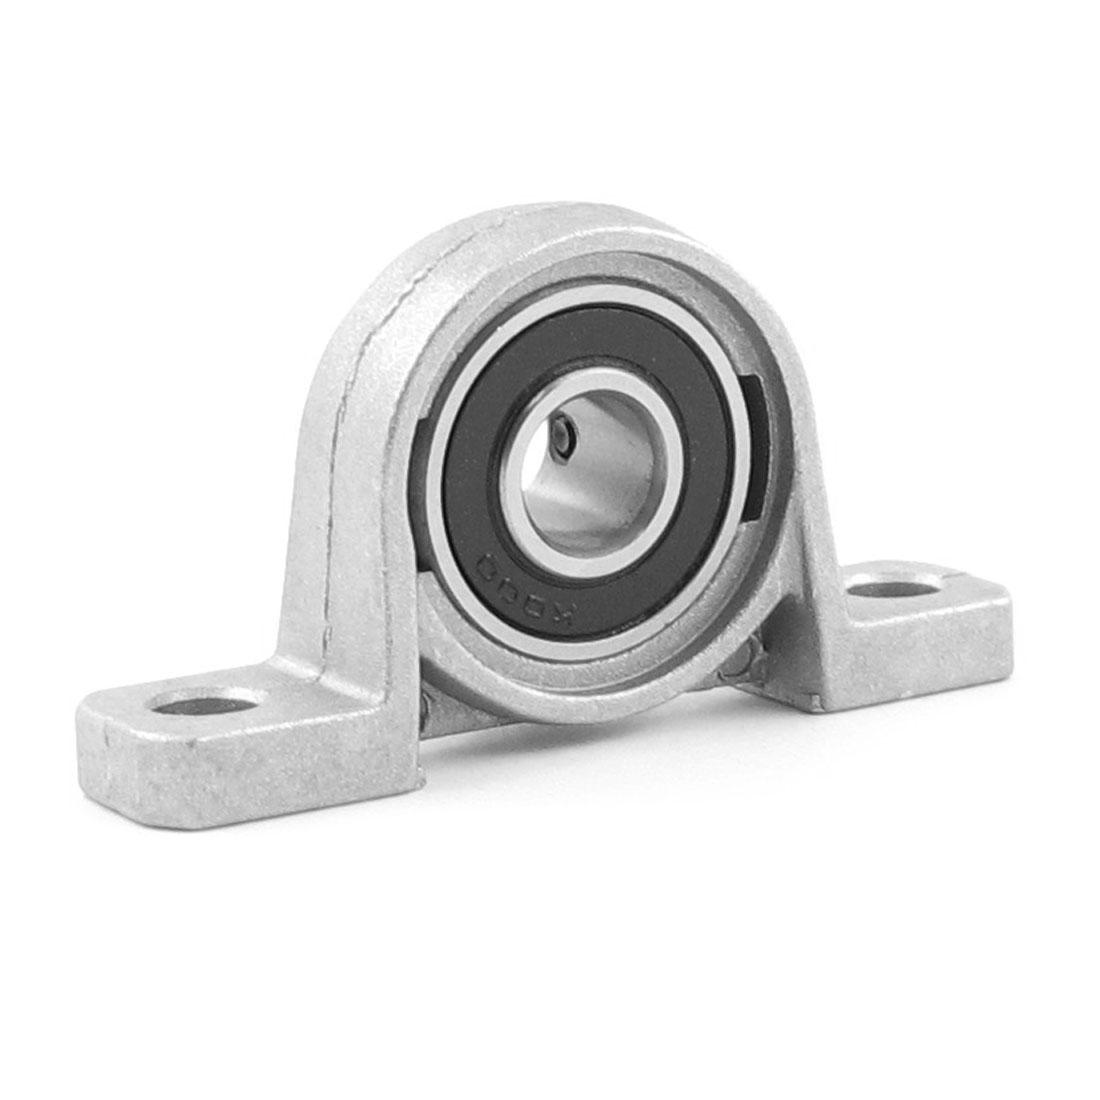 Machine KP000 Set Screw Pressed Steel Solid Base Pillow Block Bearing